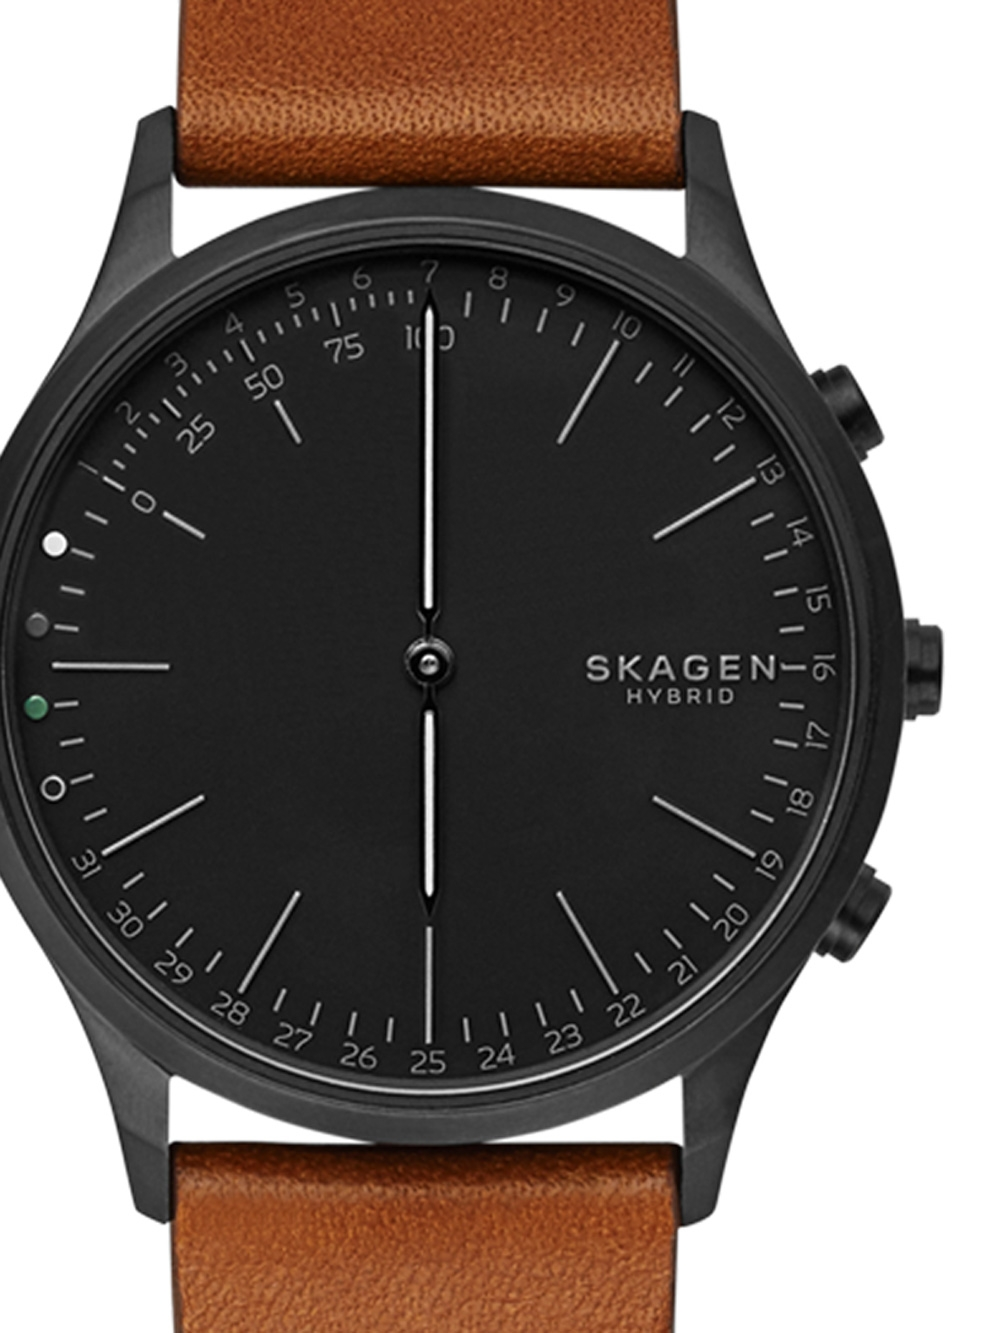 Skagen SKT1202 Jorn Hybrid Smartwatch 41mm 3ATM